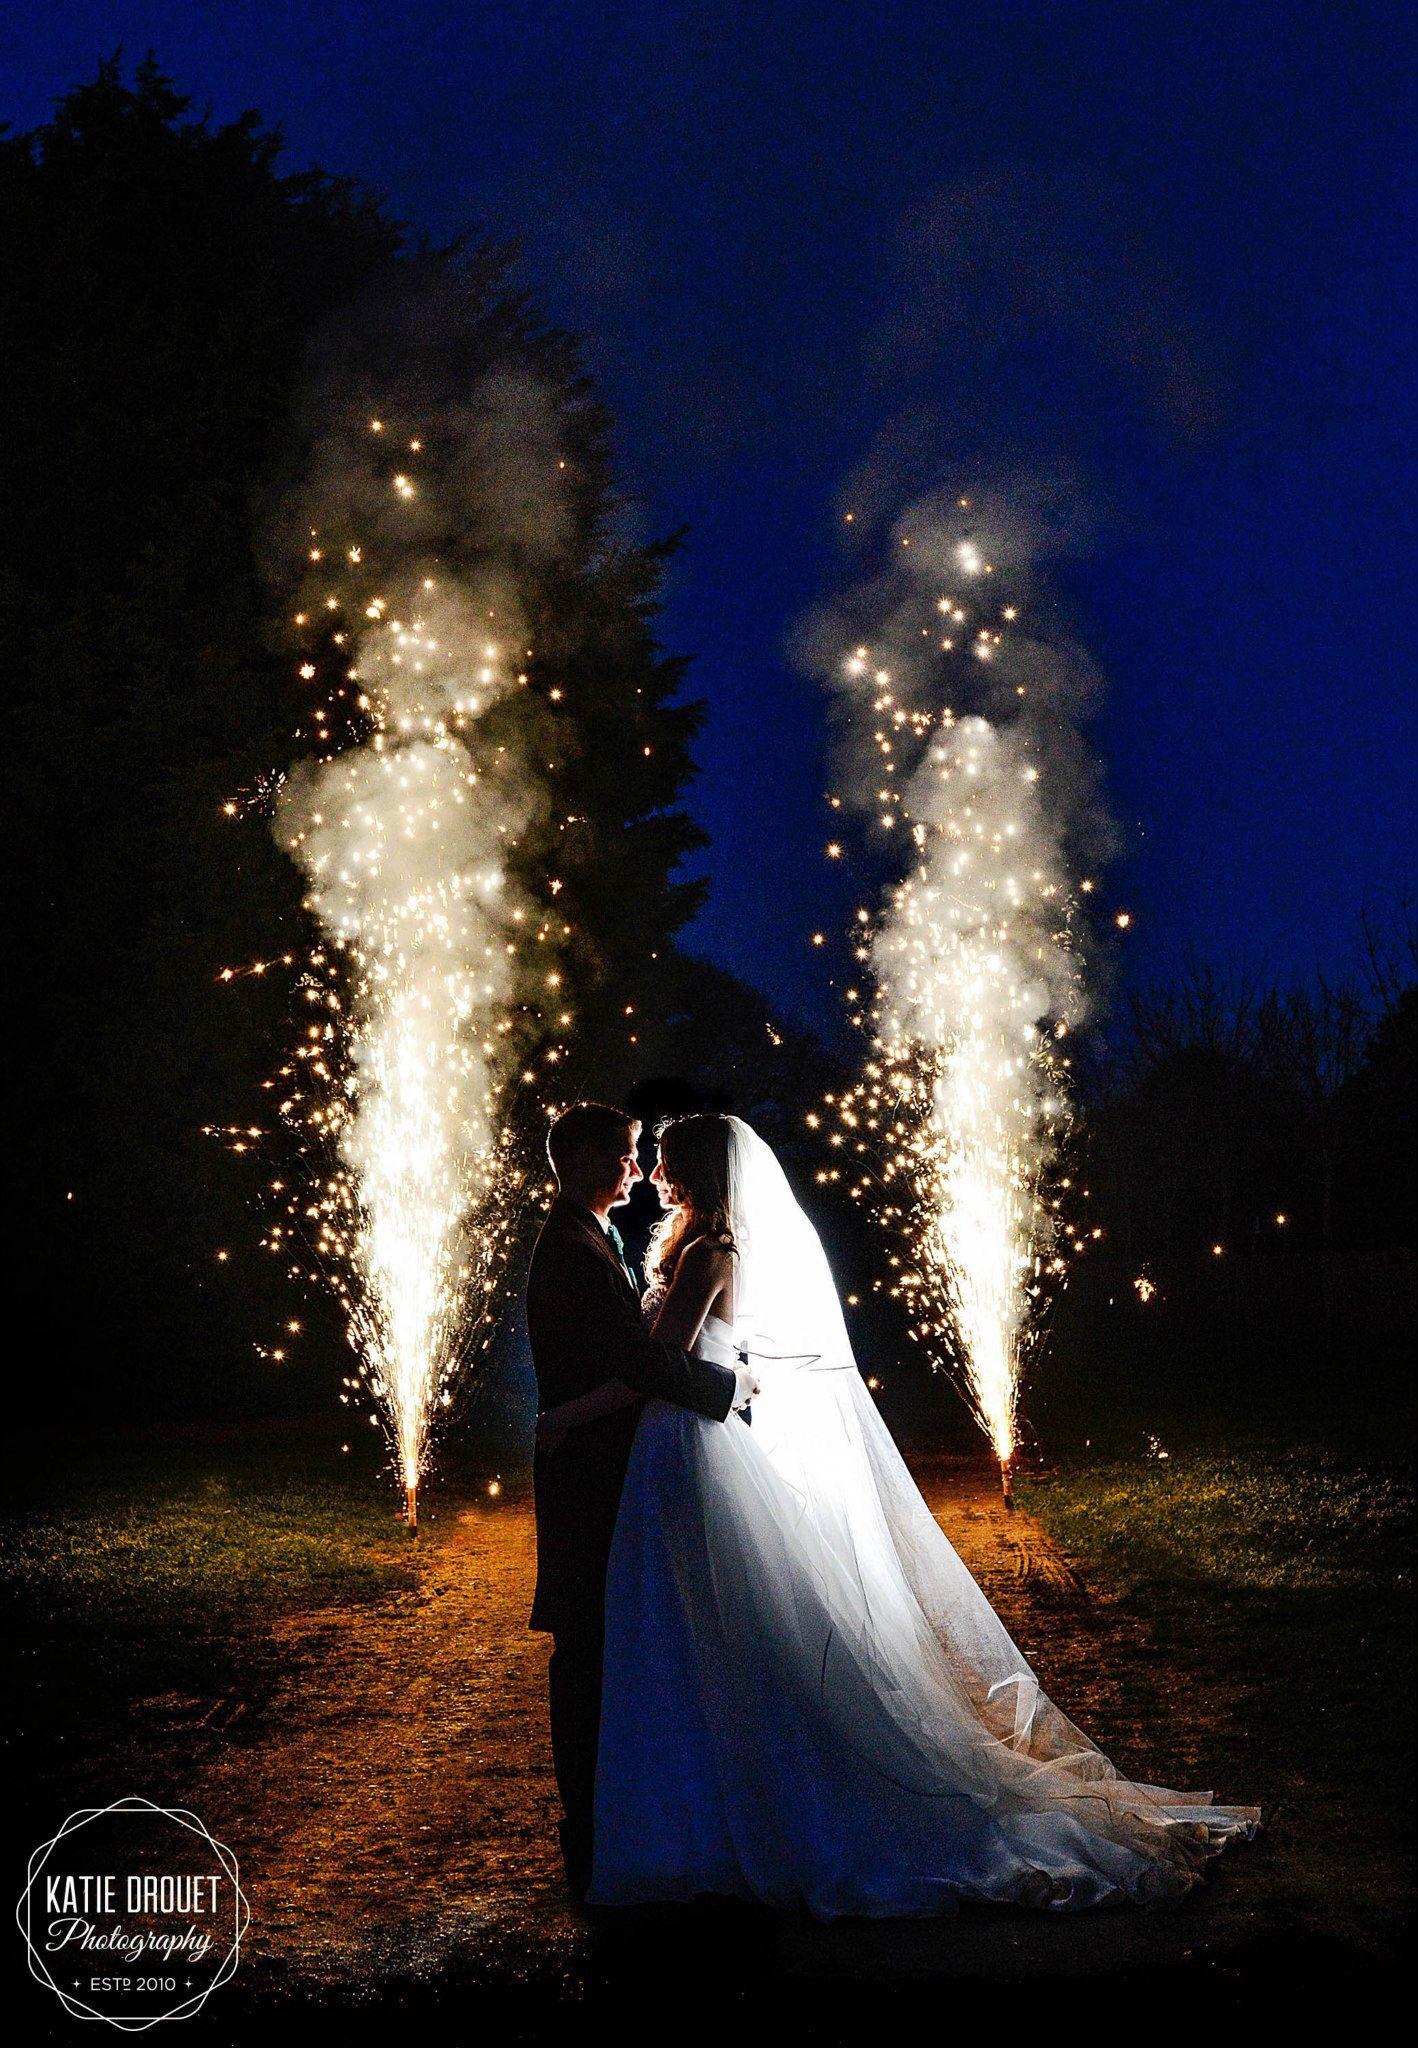 Pin By Sydney Tai On Wedding Day Night Wedding Photography Wedding Fireworks Night Time Wedding